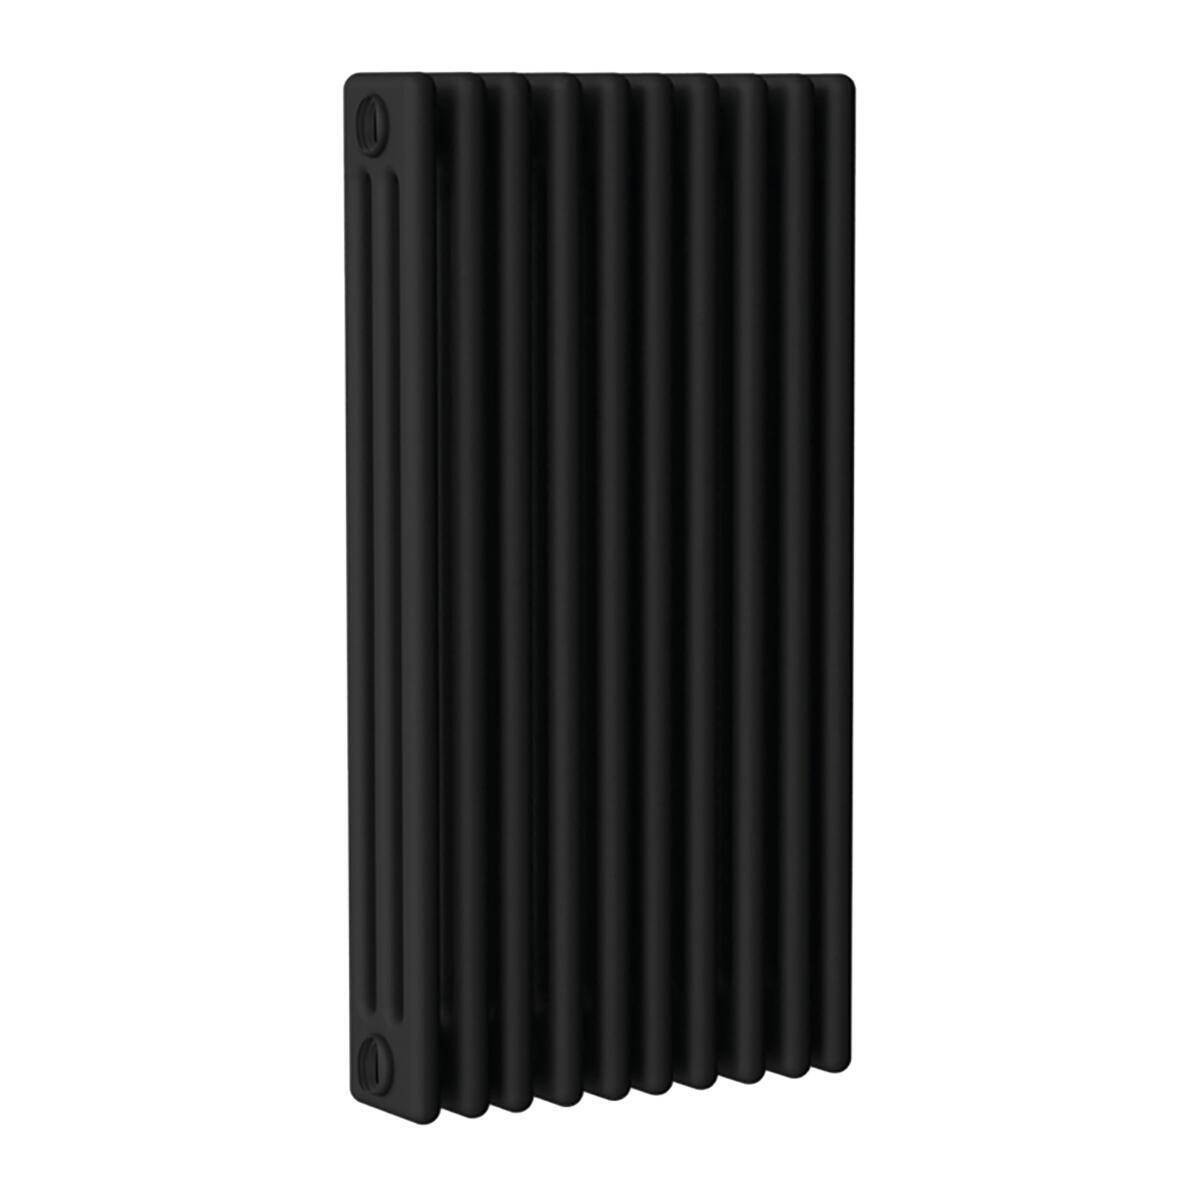 Radiatore acqua calda ERCOS nero opaco satinato in acciaio 10 elementi interasse 53,5 cm